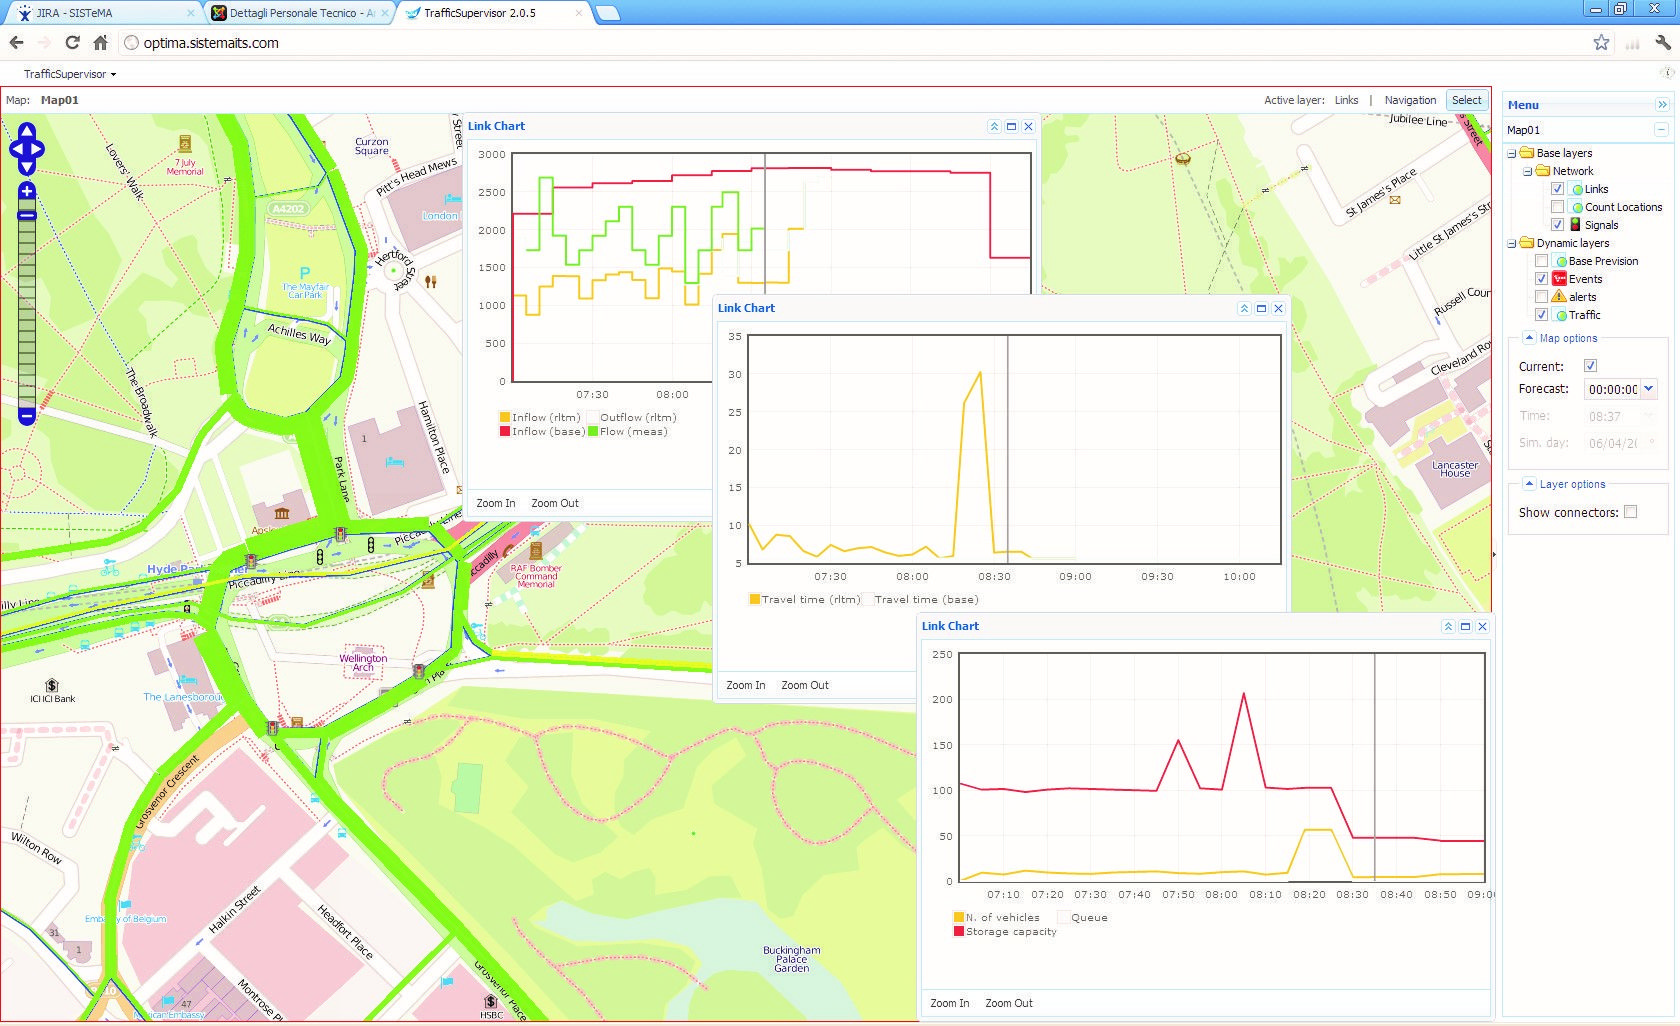 google maps predict traffic mapsgoogleca san diego traffic map. google maps predict traffic how to show traffic predictions on